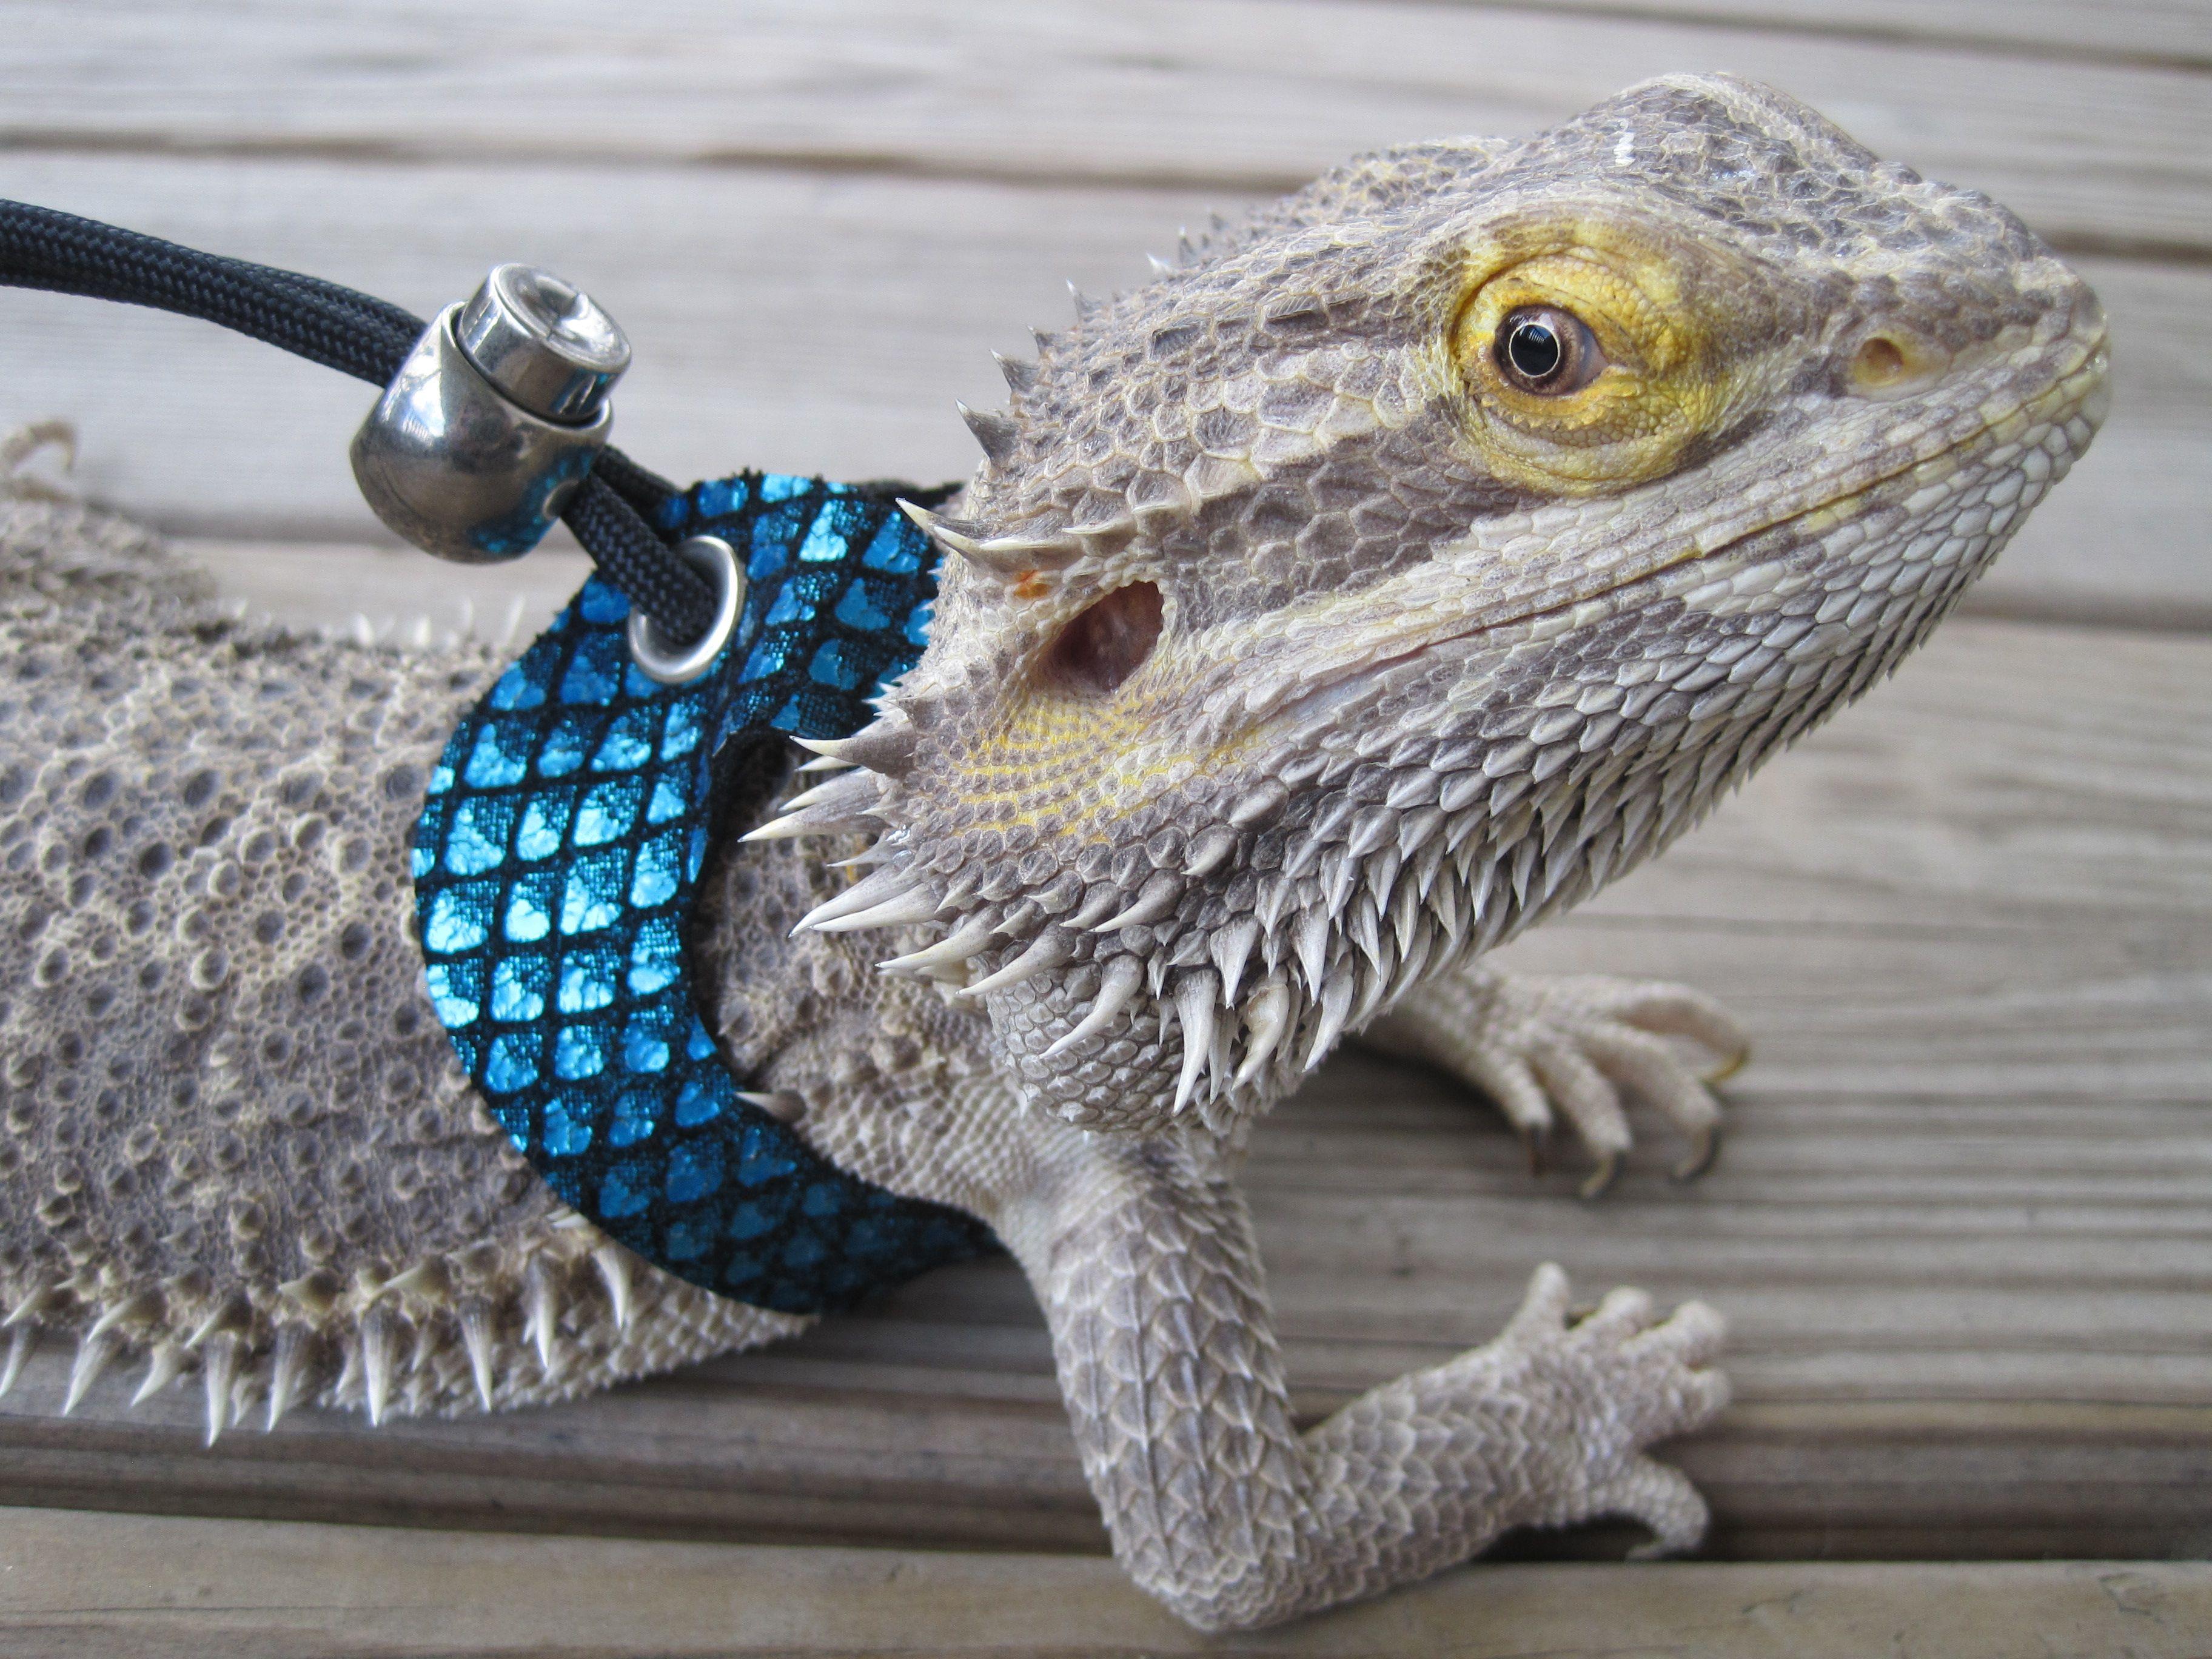 Leather Lizard Harness by Lizard rs | Lizard rs | Pinterest ...